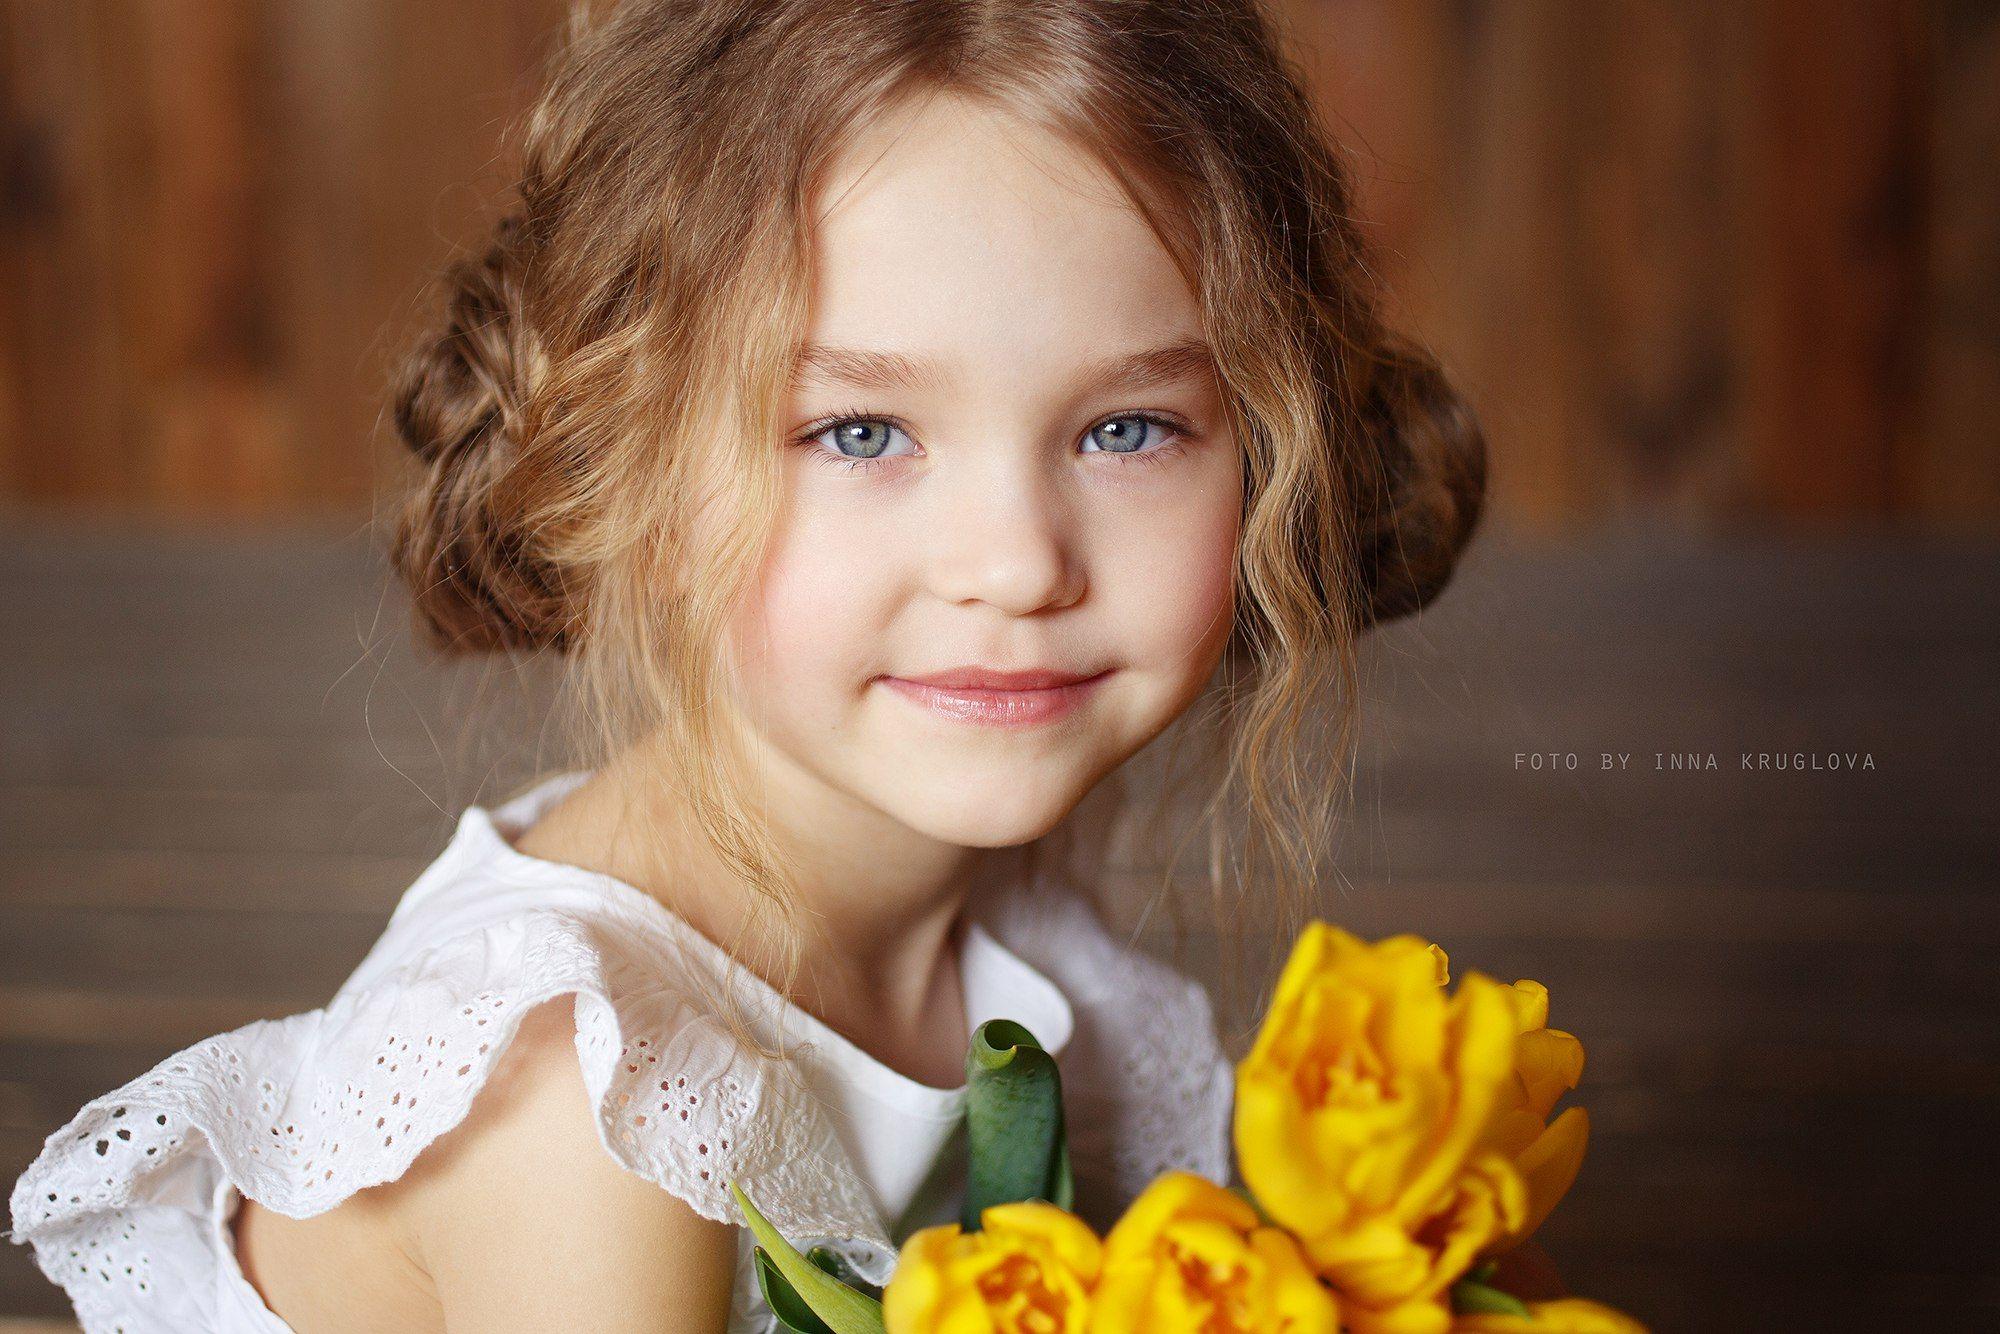 Inna child model posing